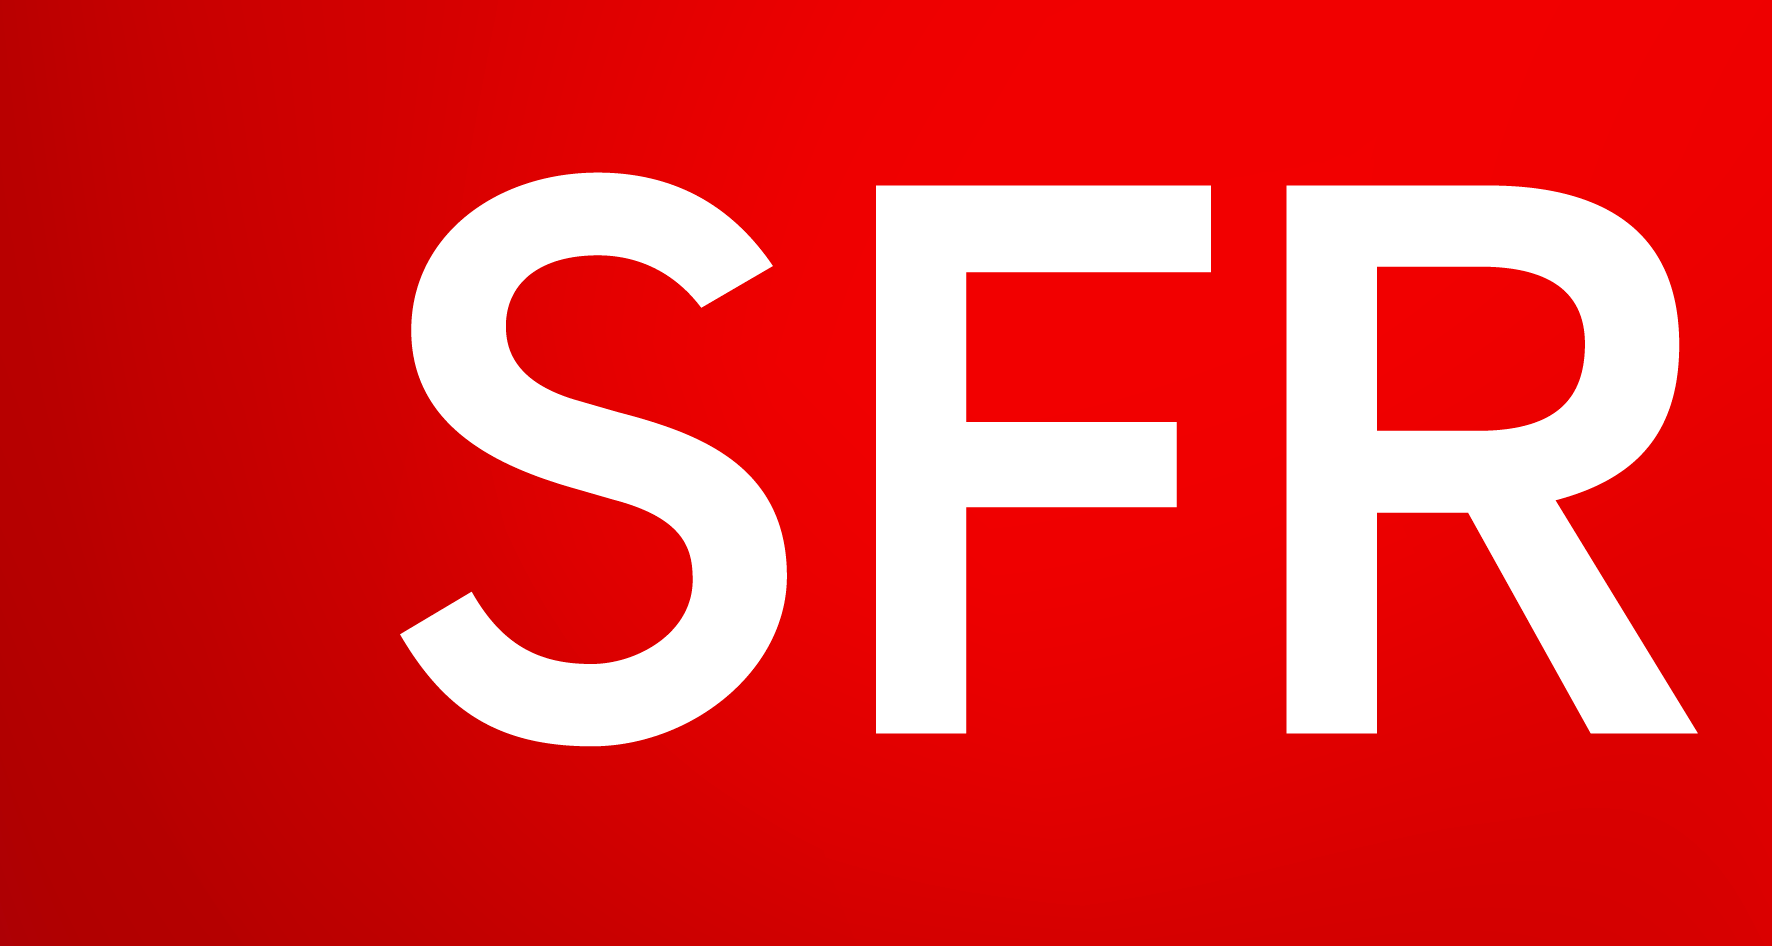 SFR - Société française du radiotéléphone